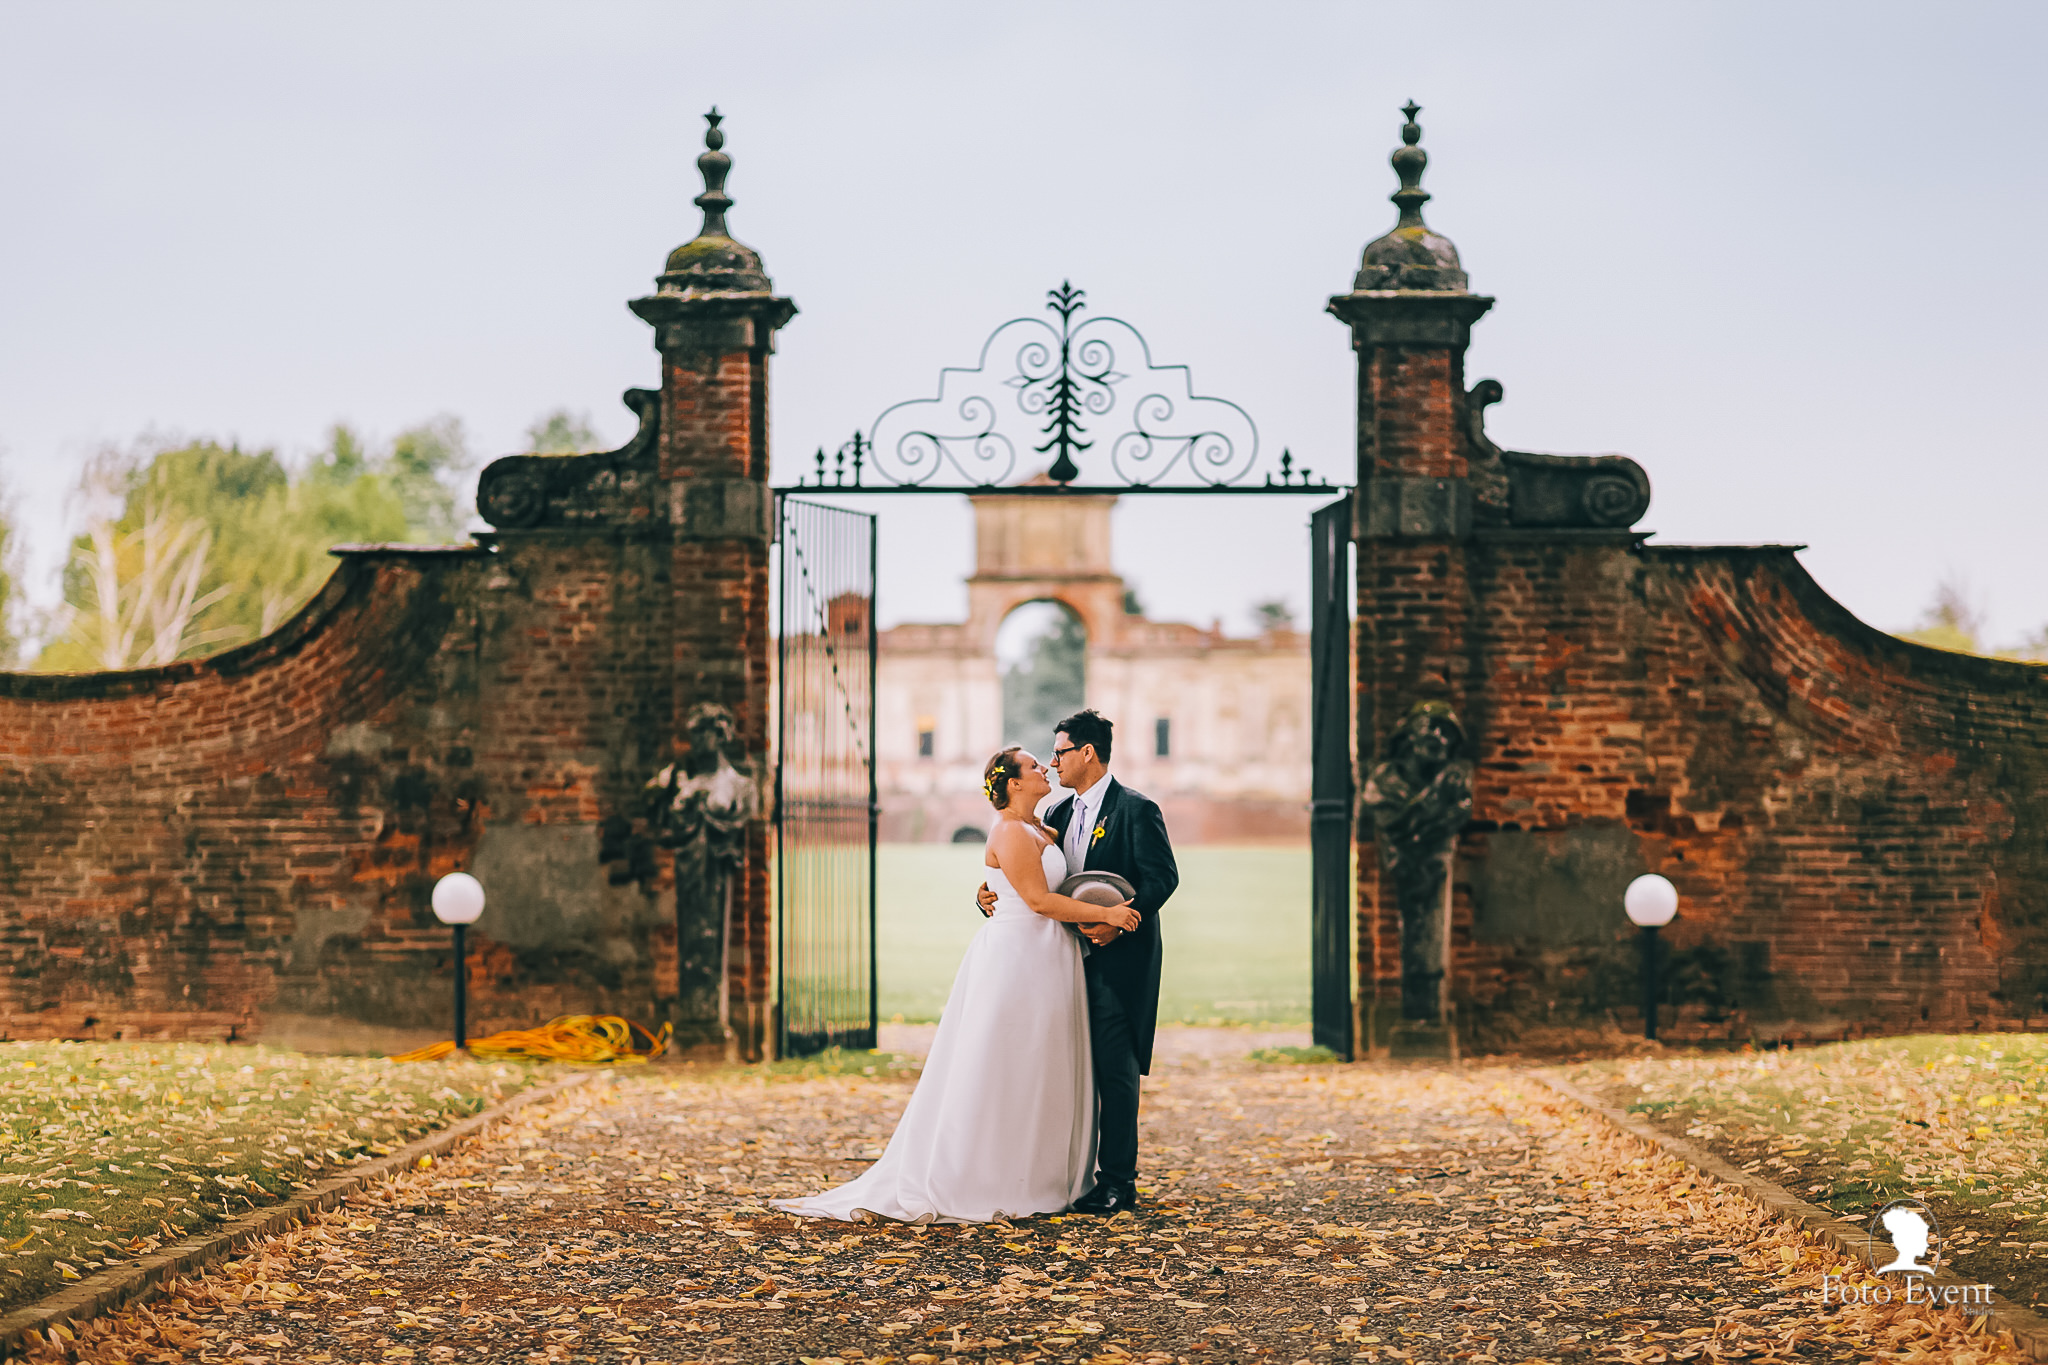 075-2019-07-27-Matrimonio-Valentina-e-Alessandro-Pettinari-80mm-423_sviluppo_1